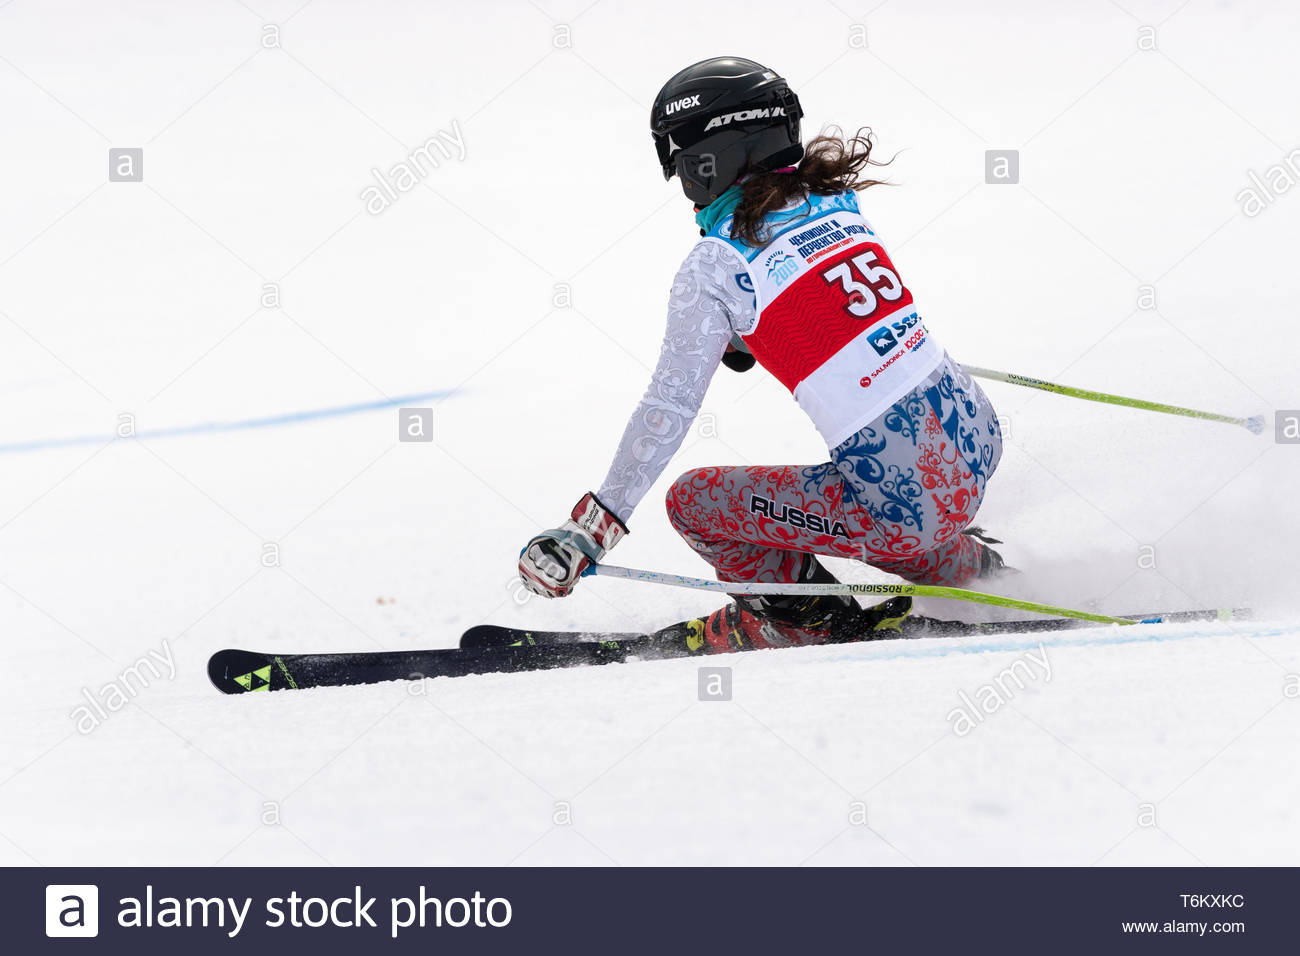 KAMCHATKA PENINSULA, RUSSIA - APR 2, 2019: Mountain skier Polina Delkhman (Krasnoyarsk) skiing down mount. International Ski Federation Championship,  - Stock Image